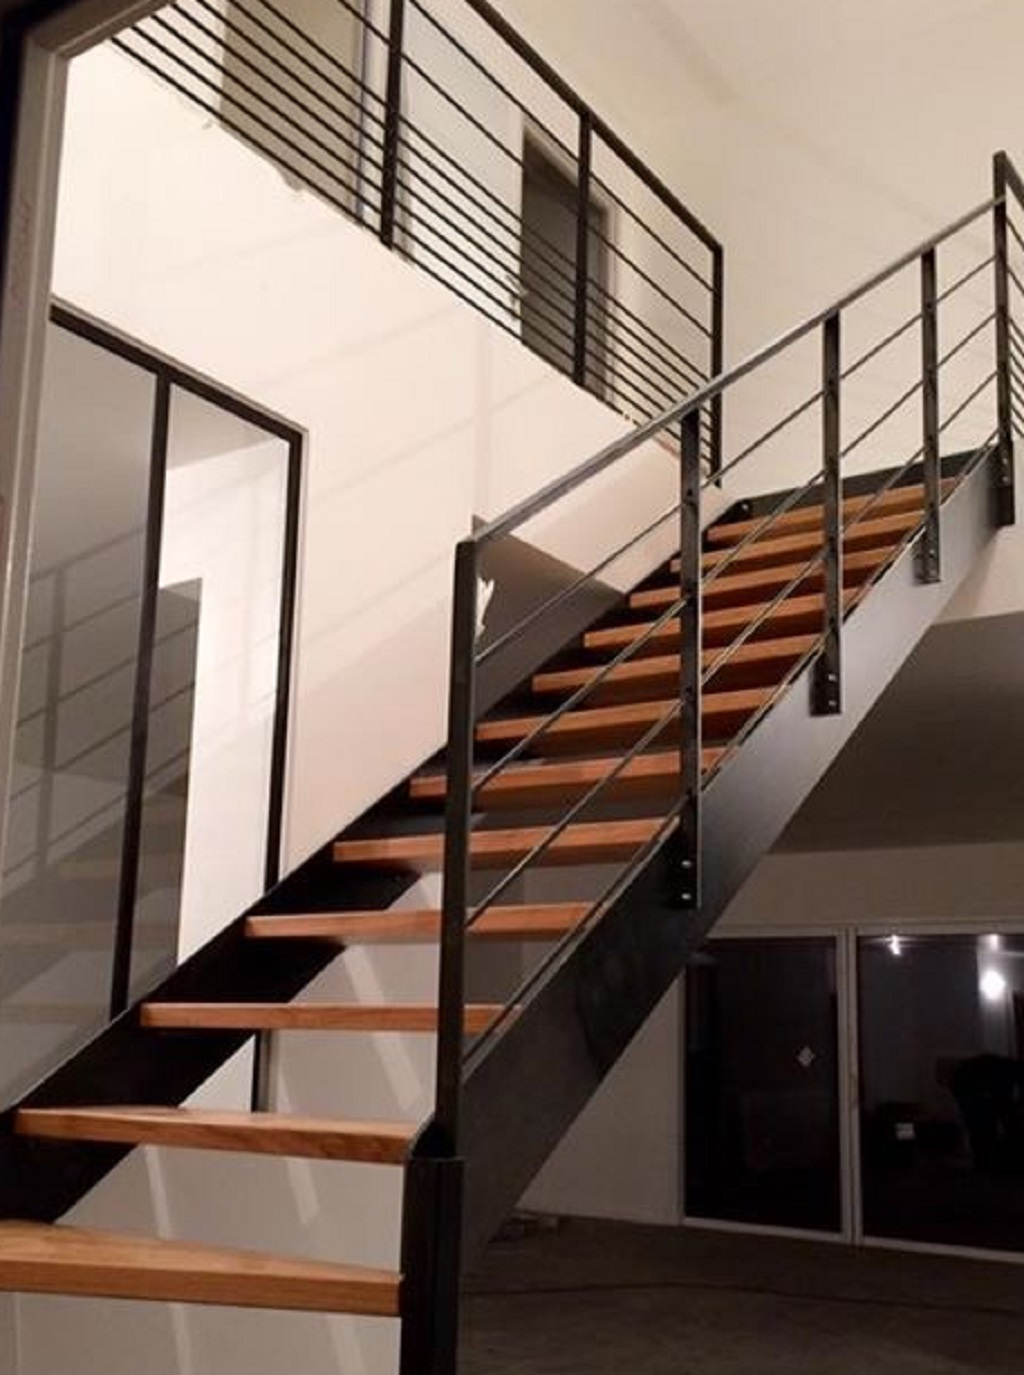 Escalier Design Bois - Stunning Escalier Metal Bois Design Gallery Design Trends 2017 paramsr us